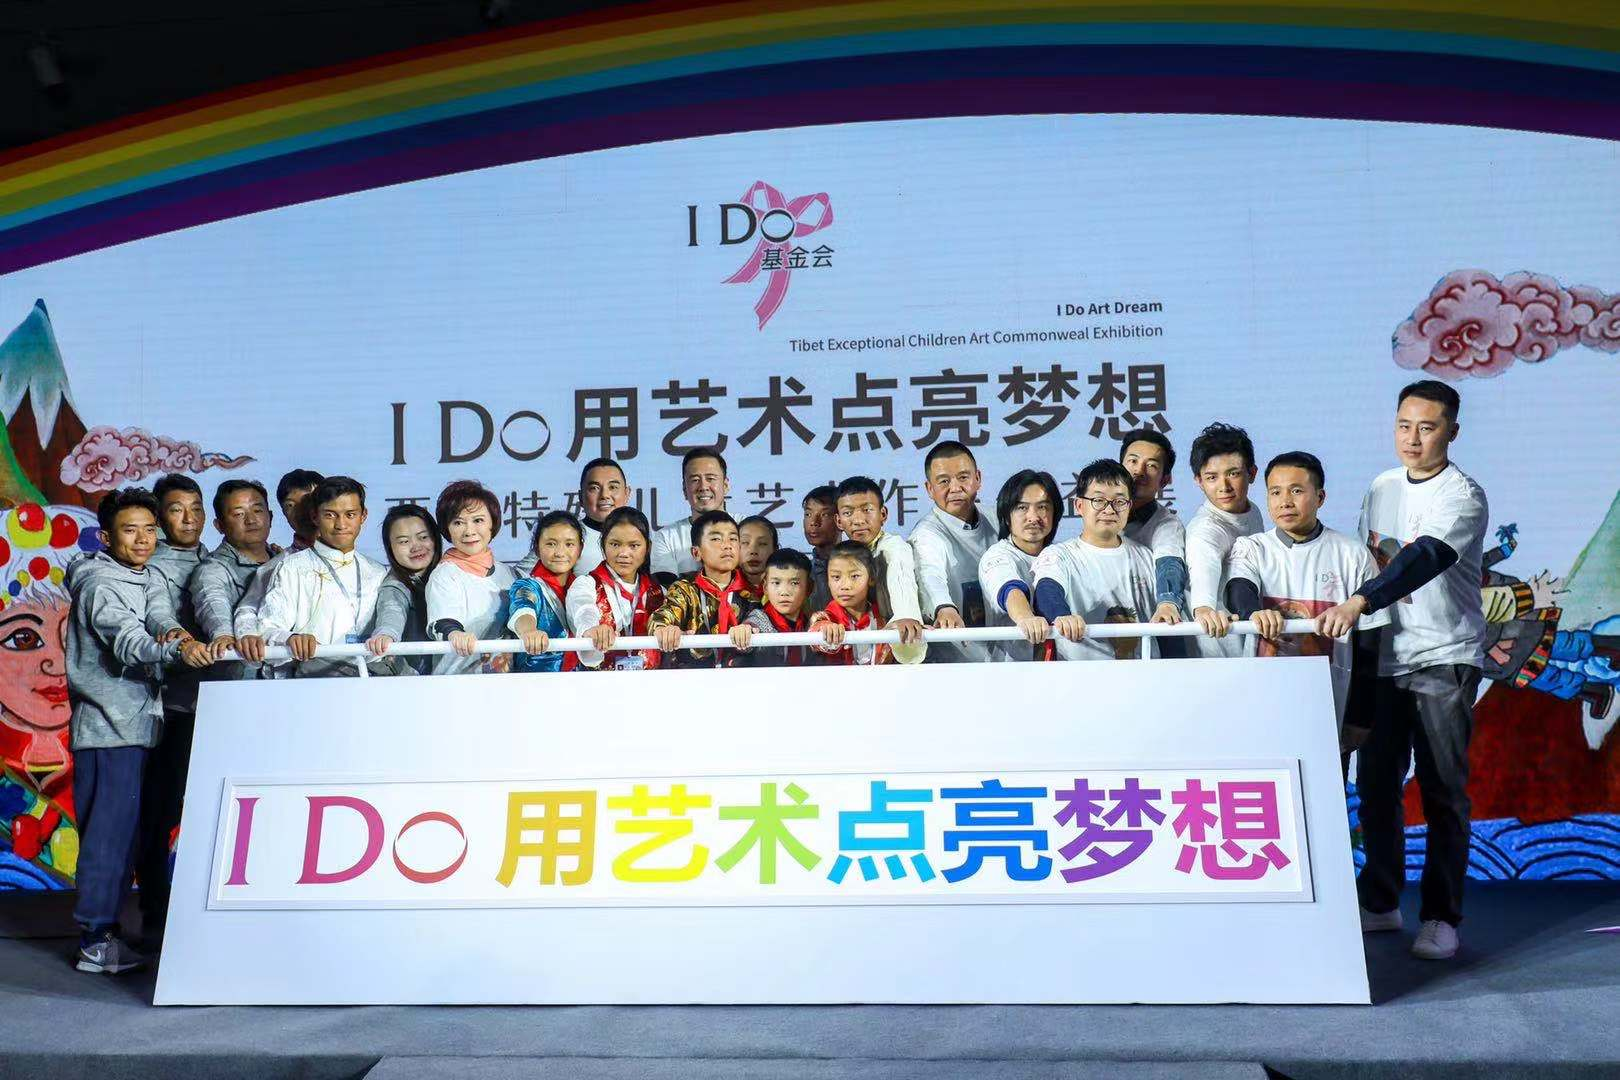 I Do基金会西藏特殊儿童公益画展开幕,加速探索艺术公益3.0生态圈